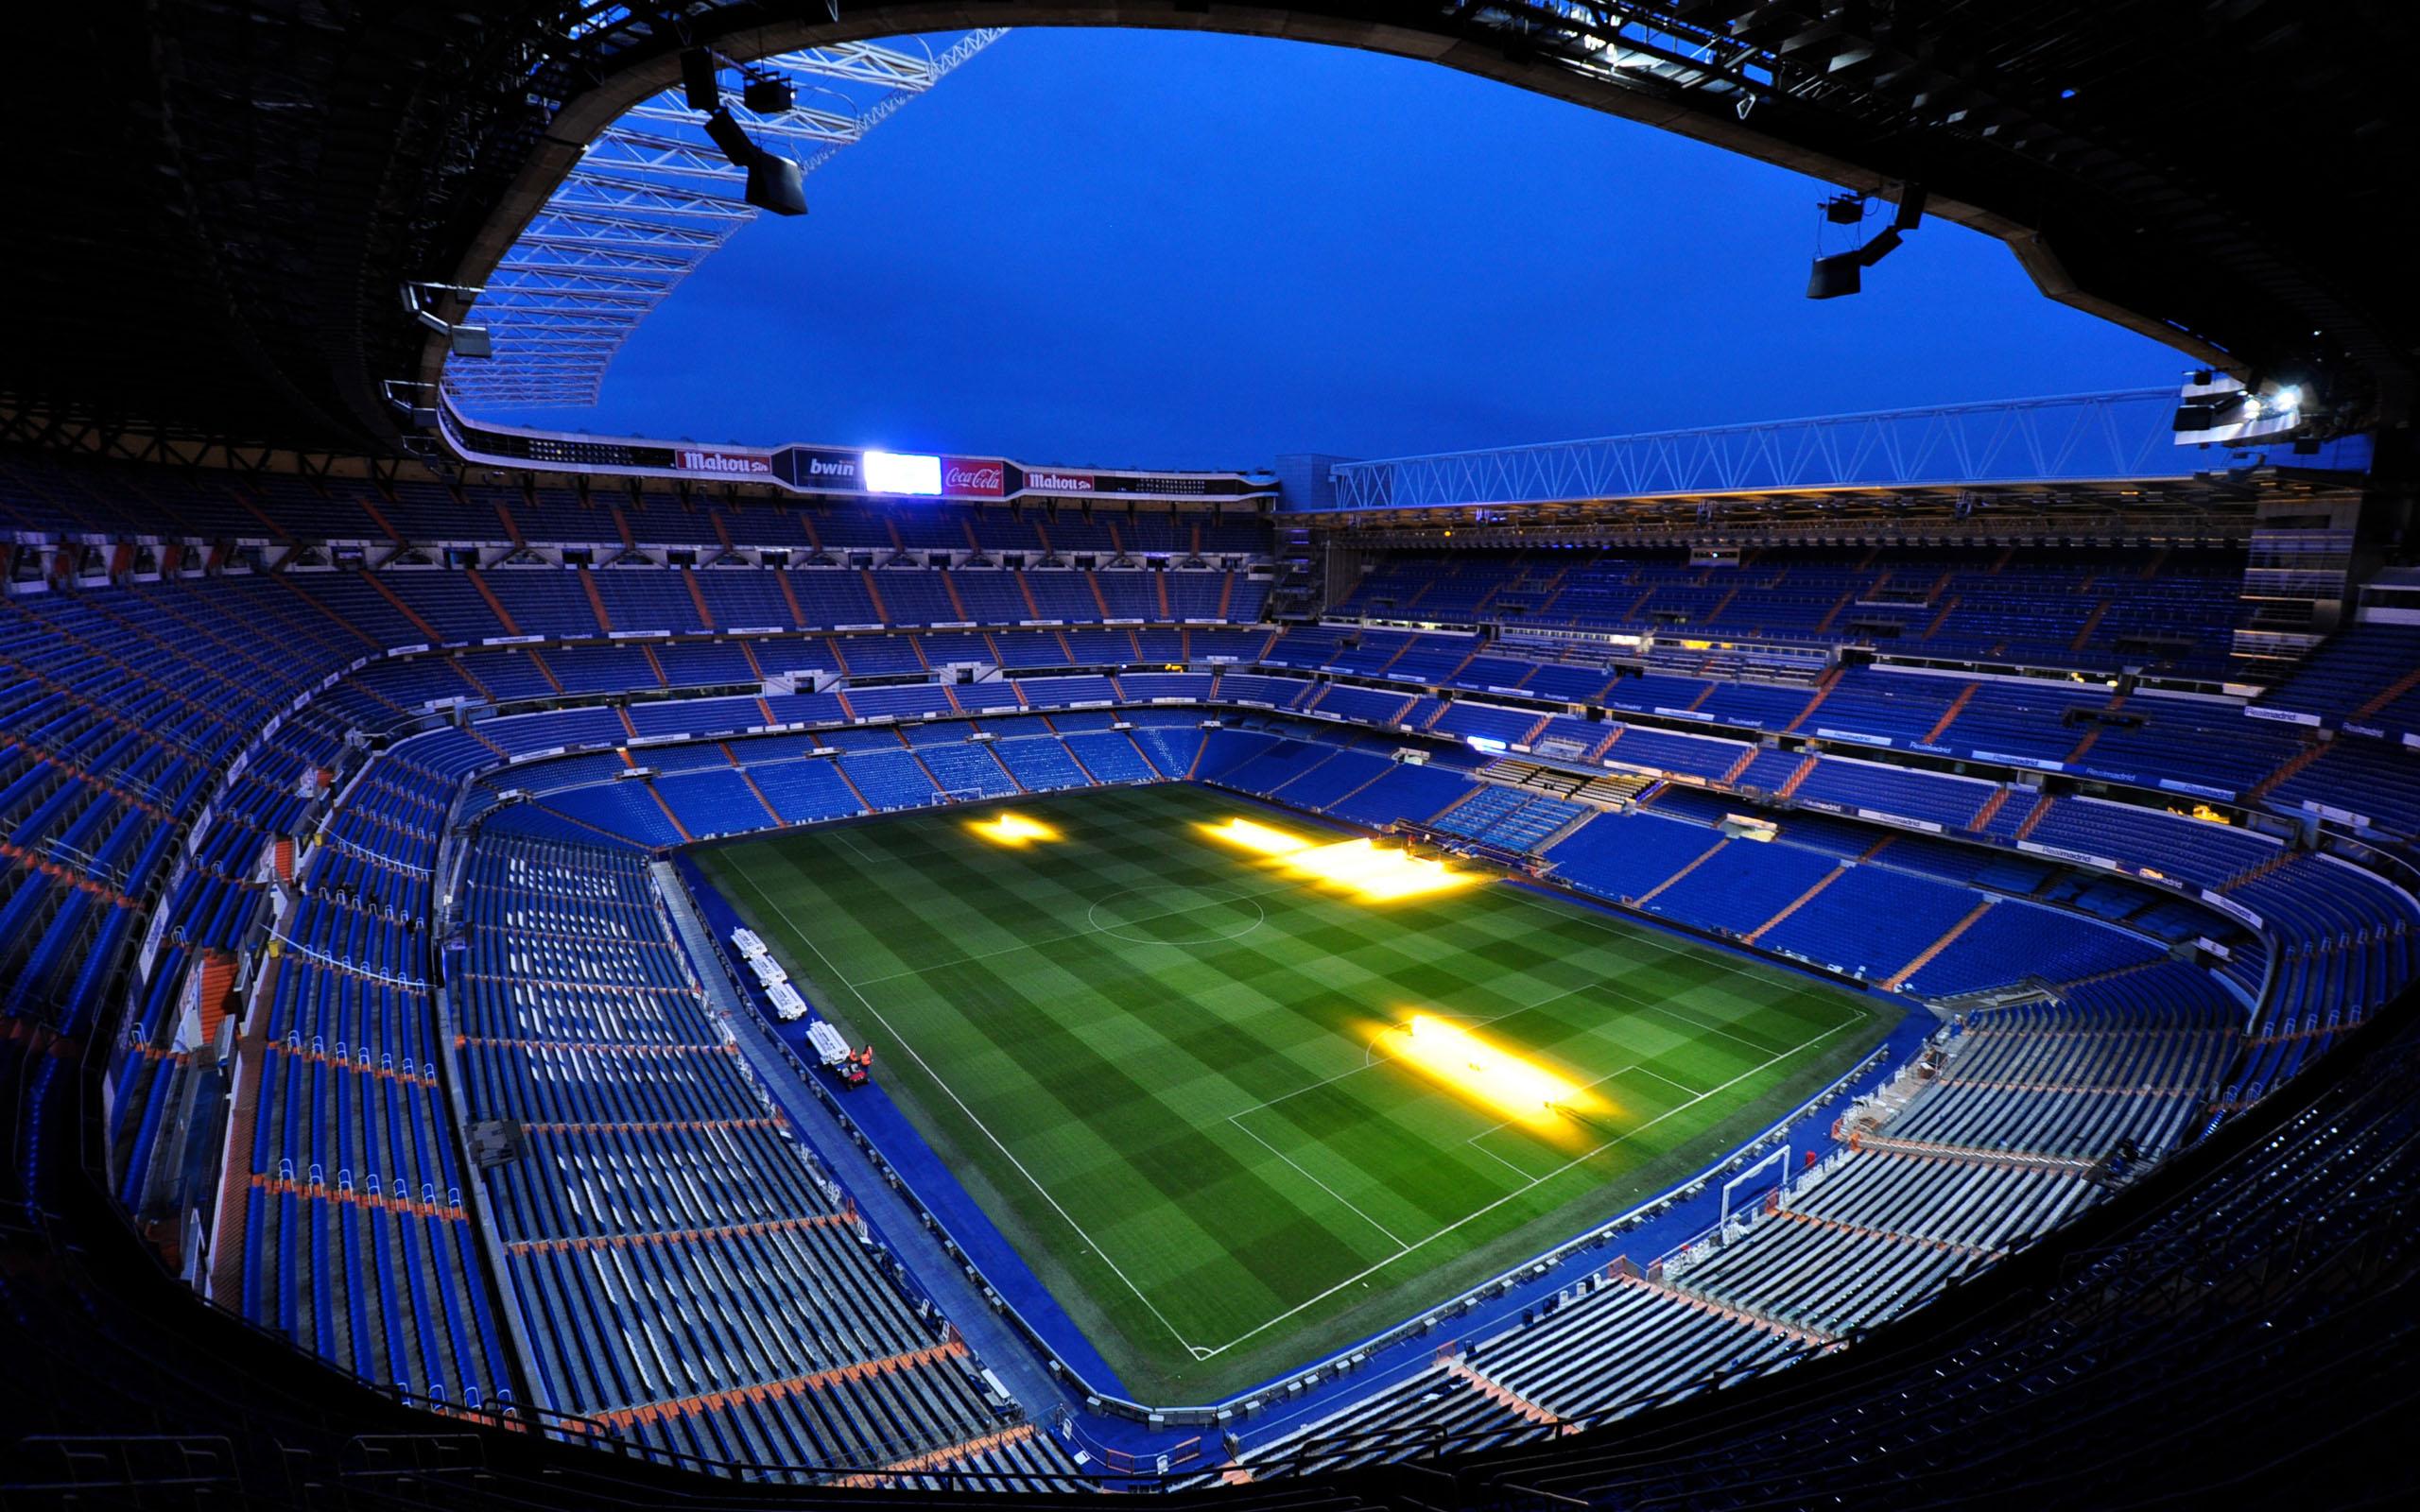 Real Madrid Wallpaper Full Hd Real Madrid Stadium Wallpapers Hd Pixelstalk Net